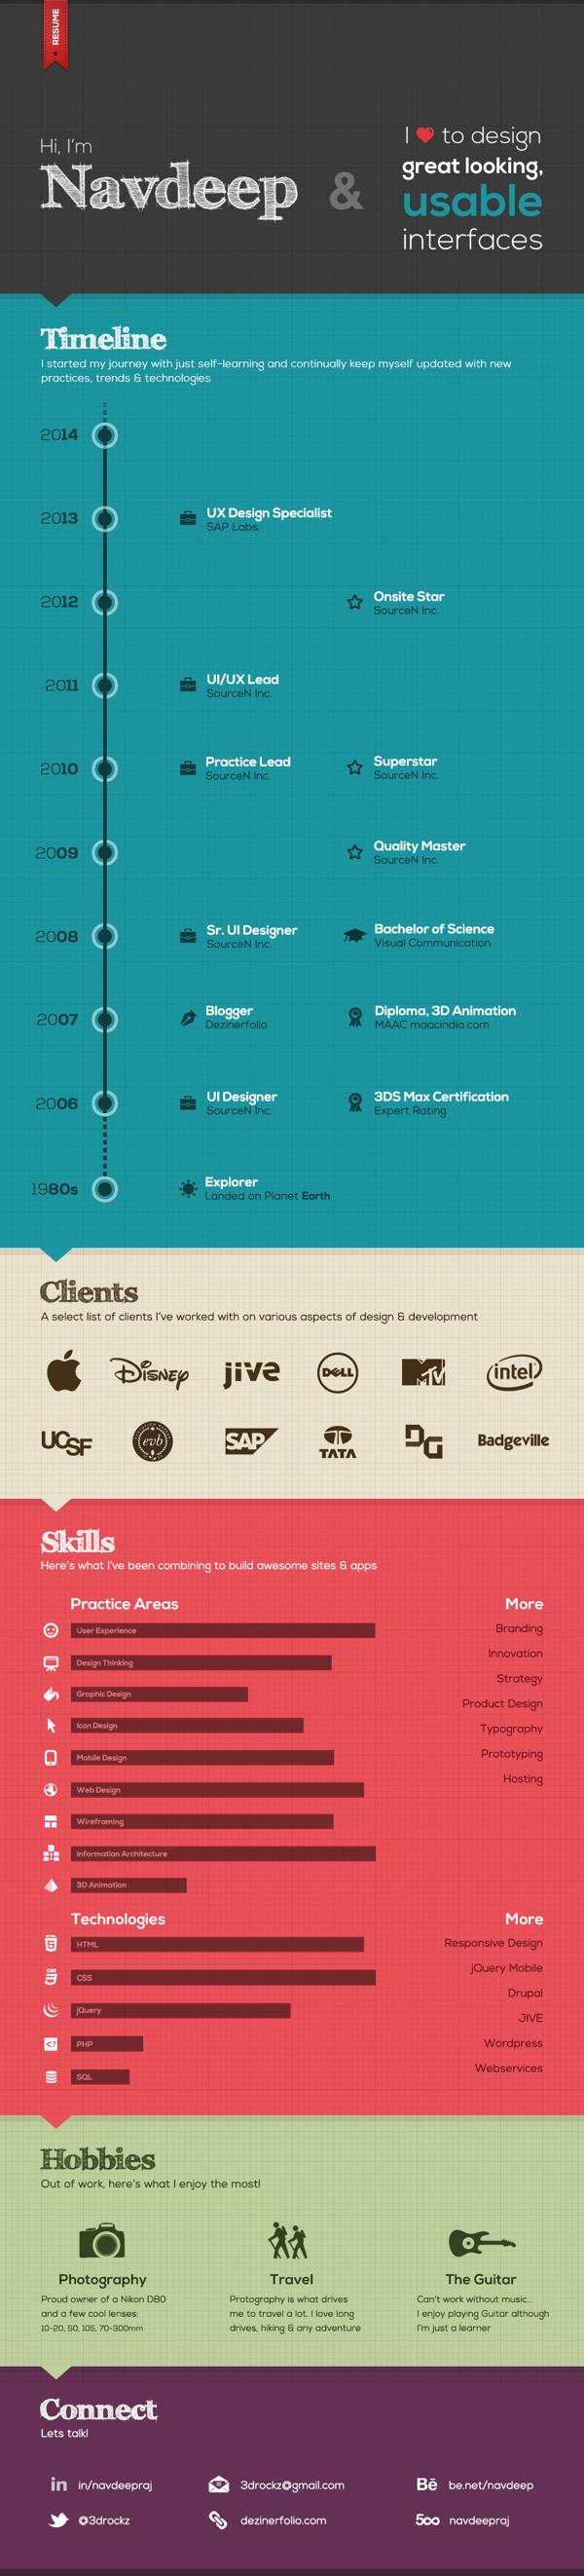 Navdeep Raj #infographic resume Design   Infographic Visual Resumes ...